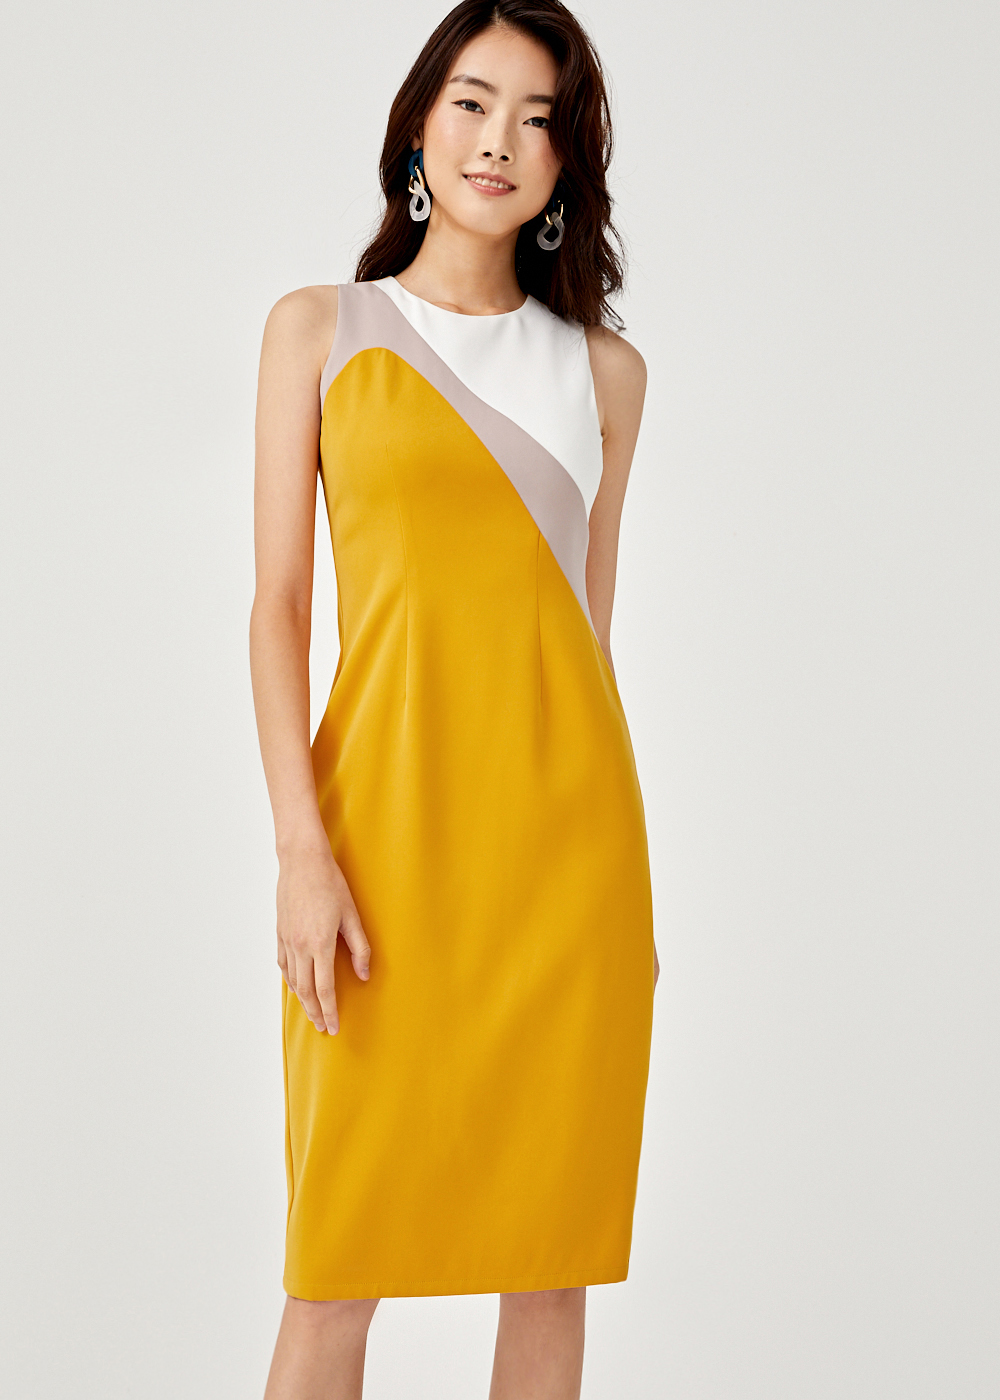 Camdynne Colour Block Pencil Dress